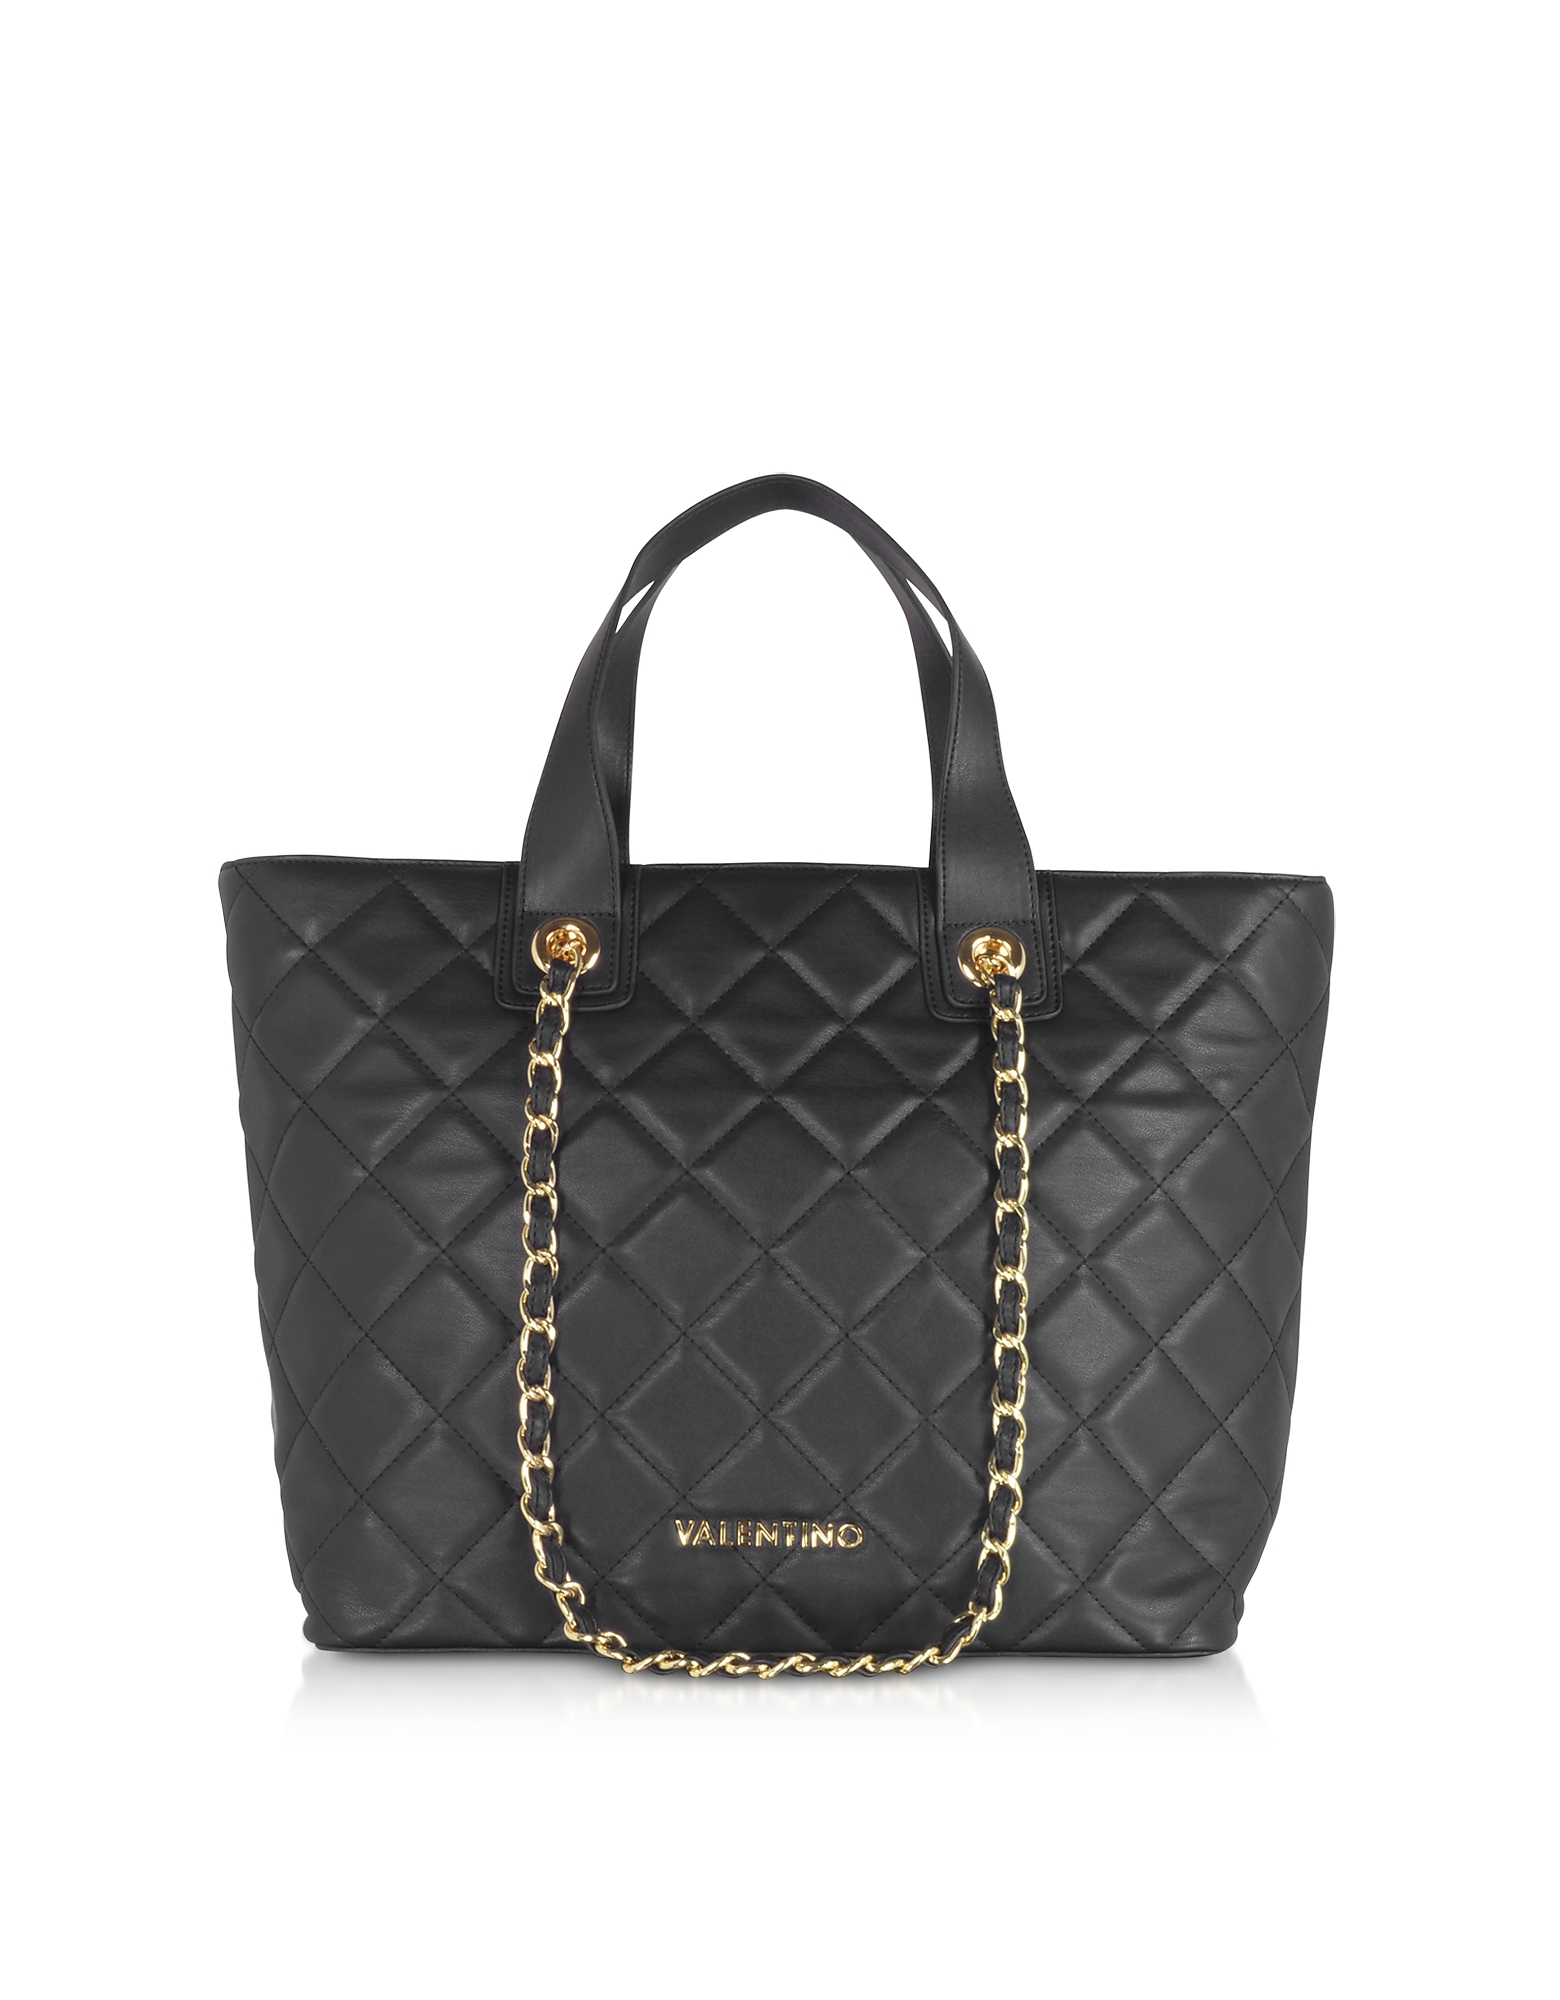 Valentino by Mario Valentino Designer Handbags, Ocarina Tote Bag